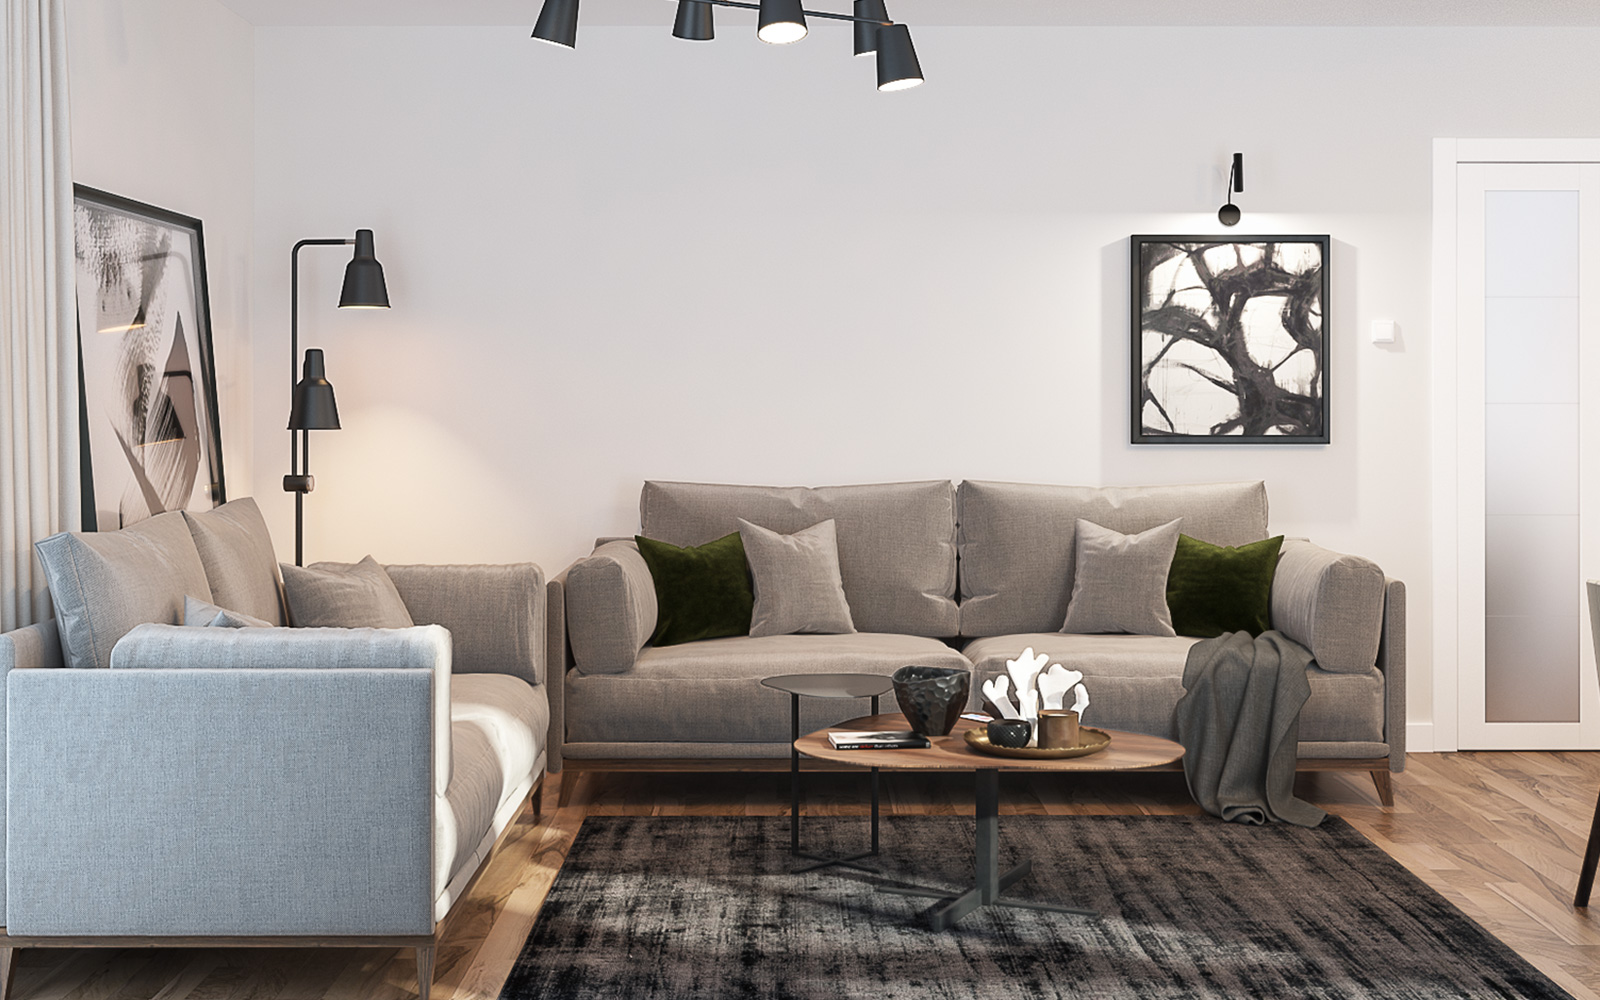 Vogue Design - Istanbul Gayrettepe Flat7